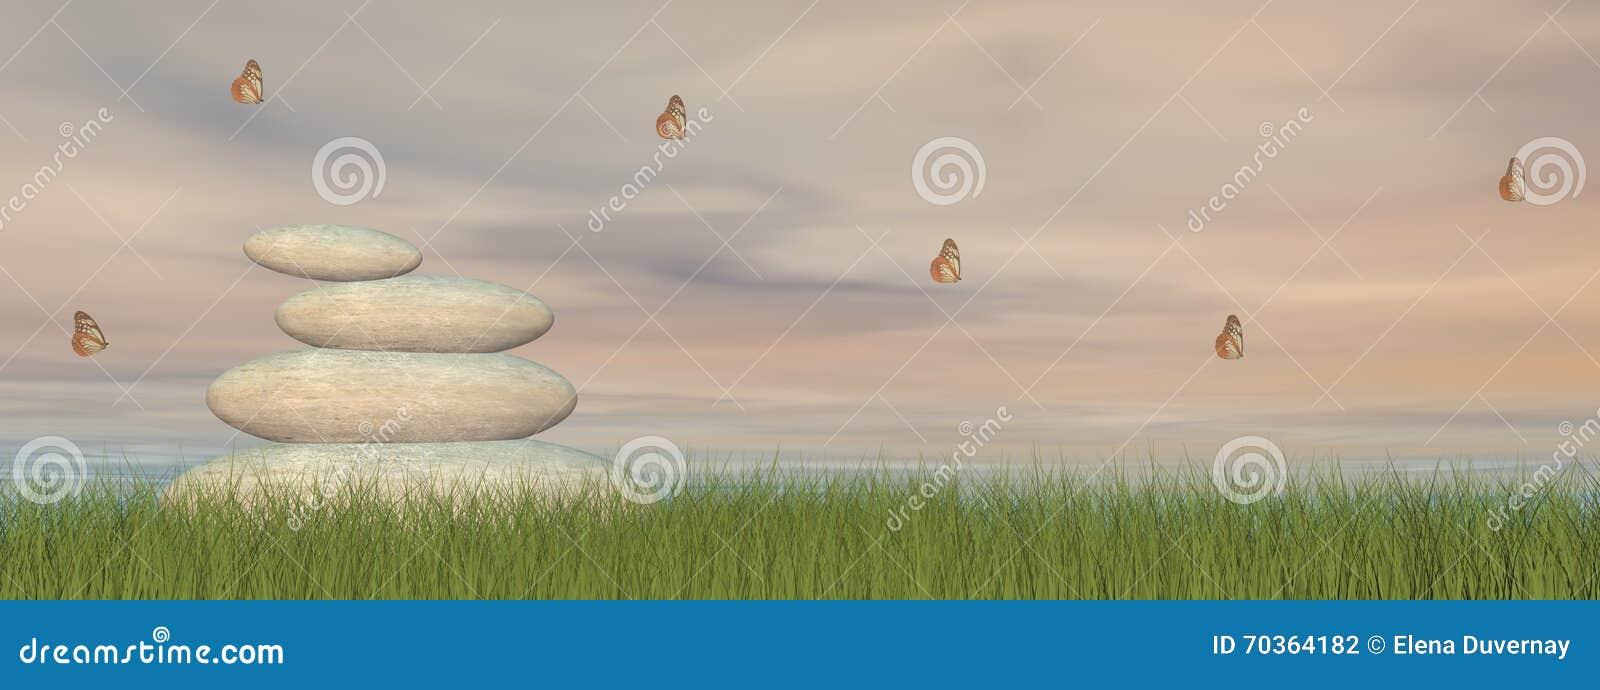 Zen Stones And Peace 3d Render Stock Illustration